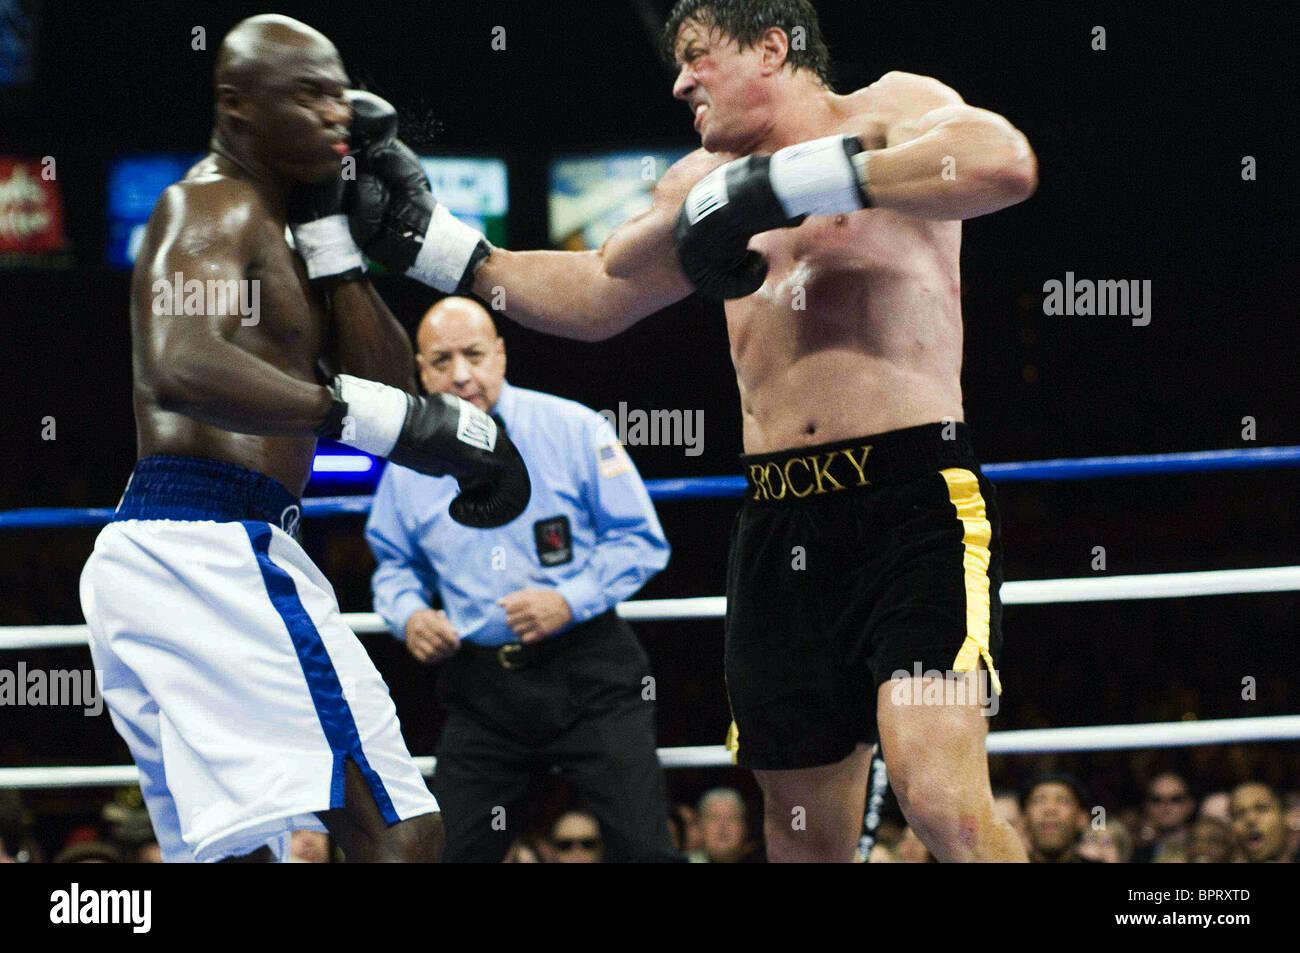 Rocky 6